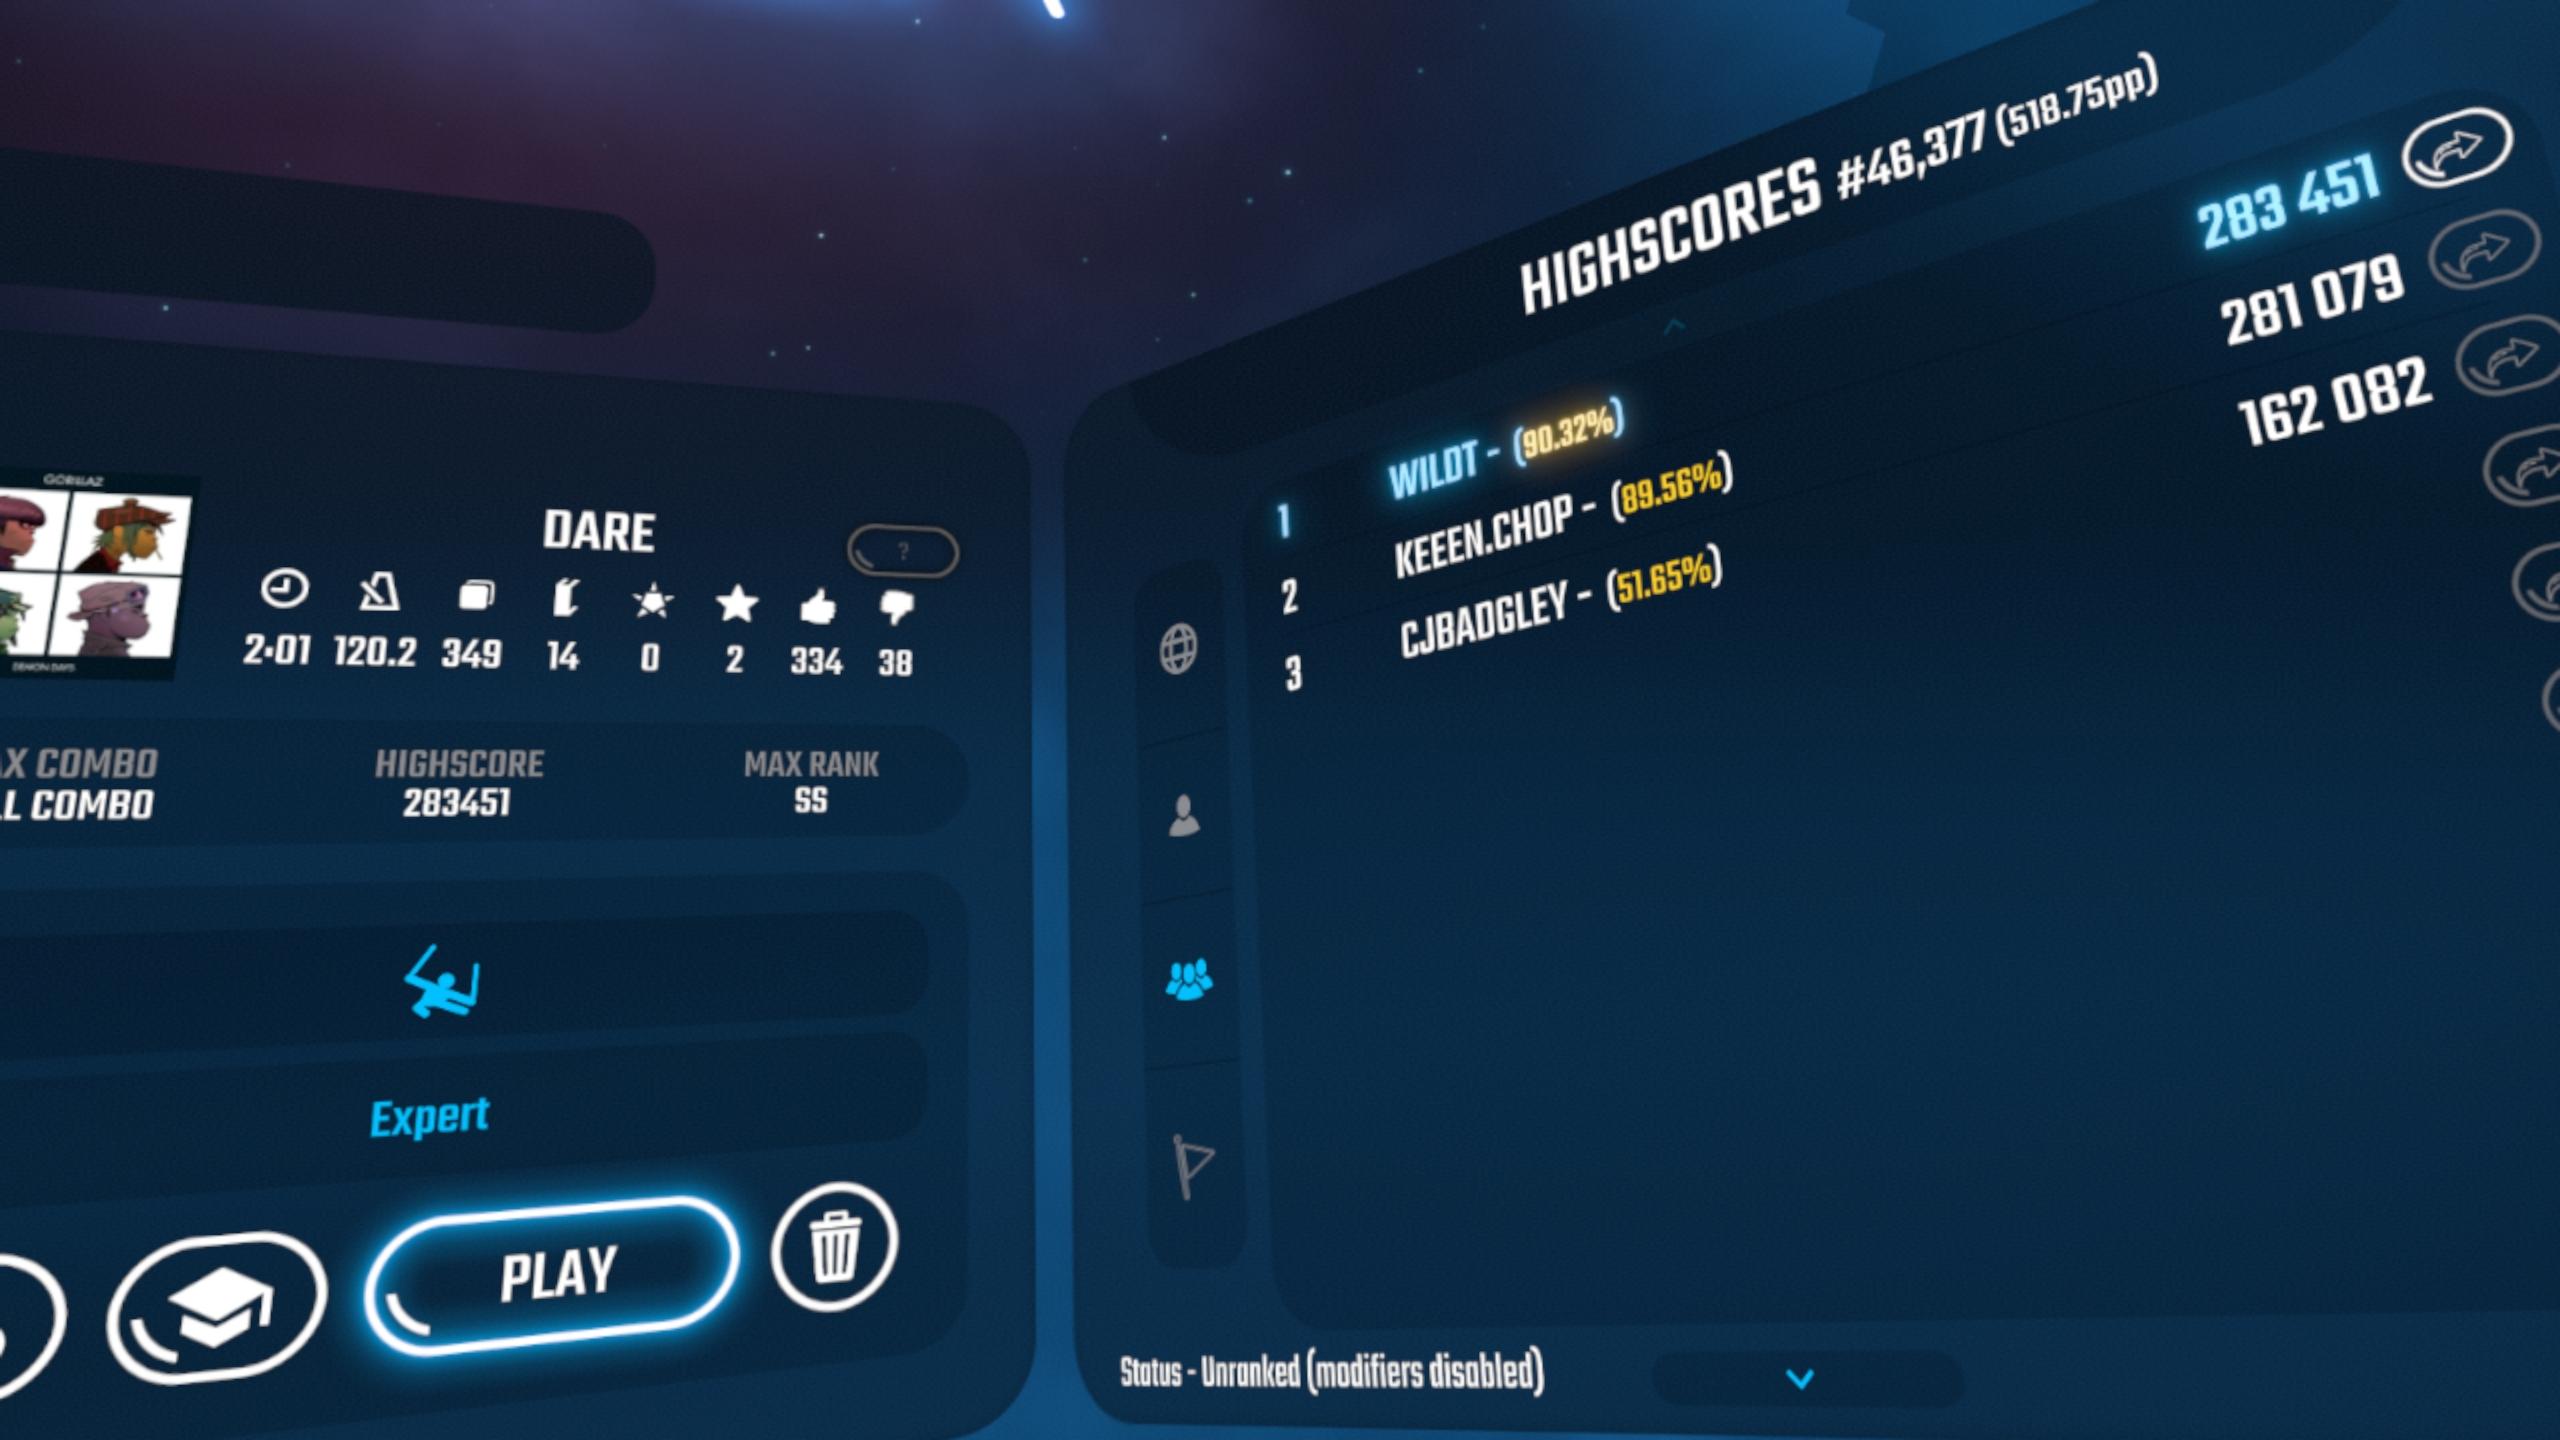 Beat Saber - Community Rankings! - Page 13 — Oculus